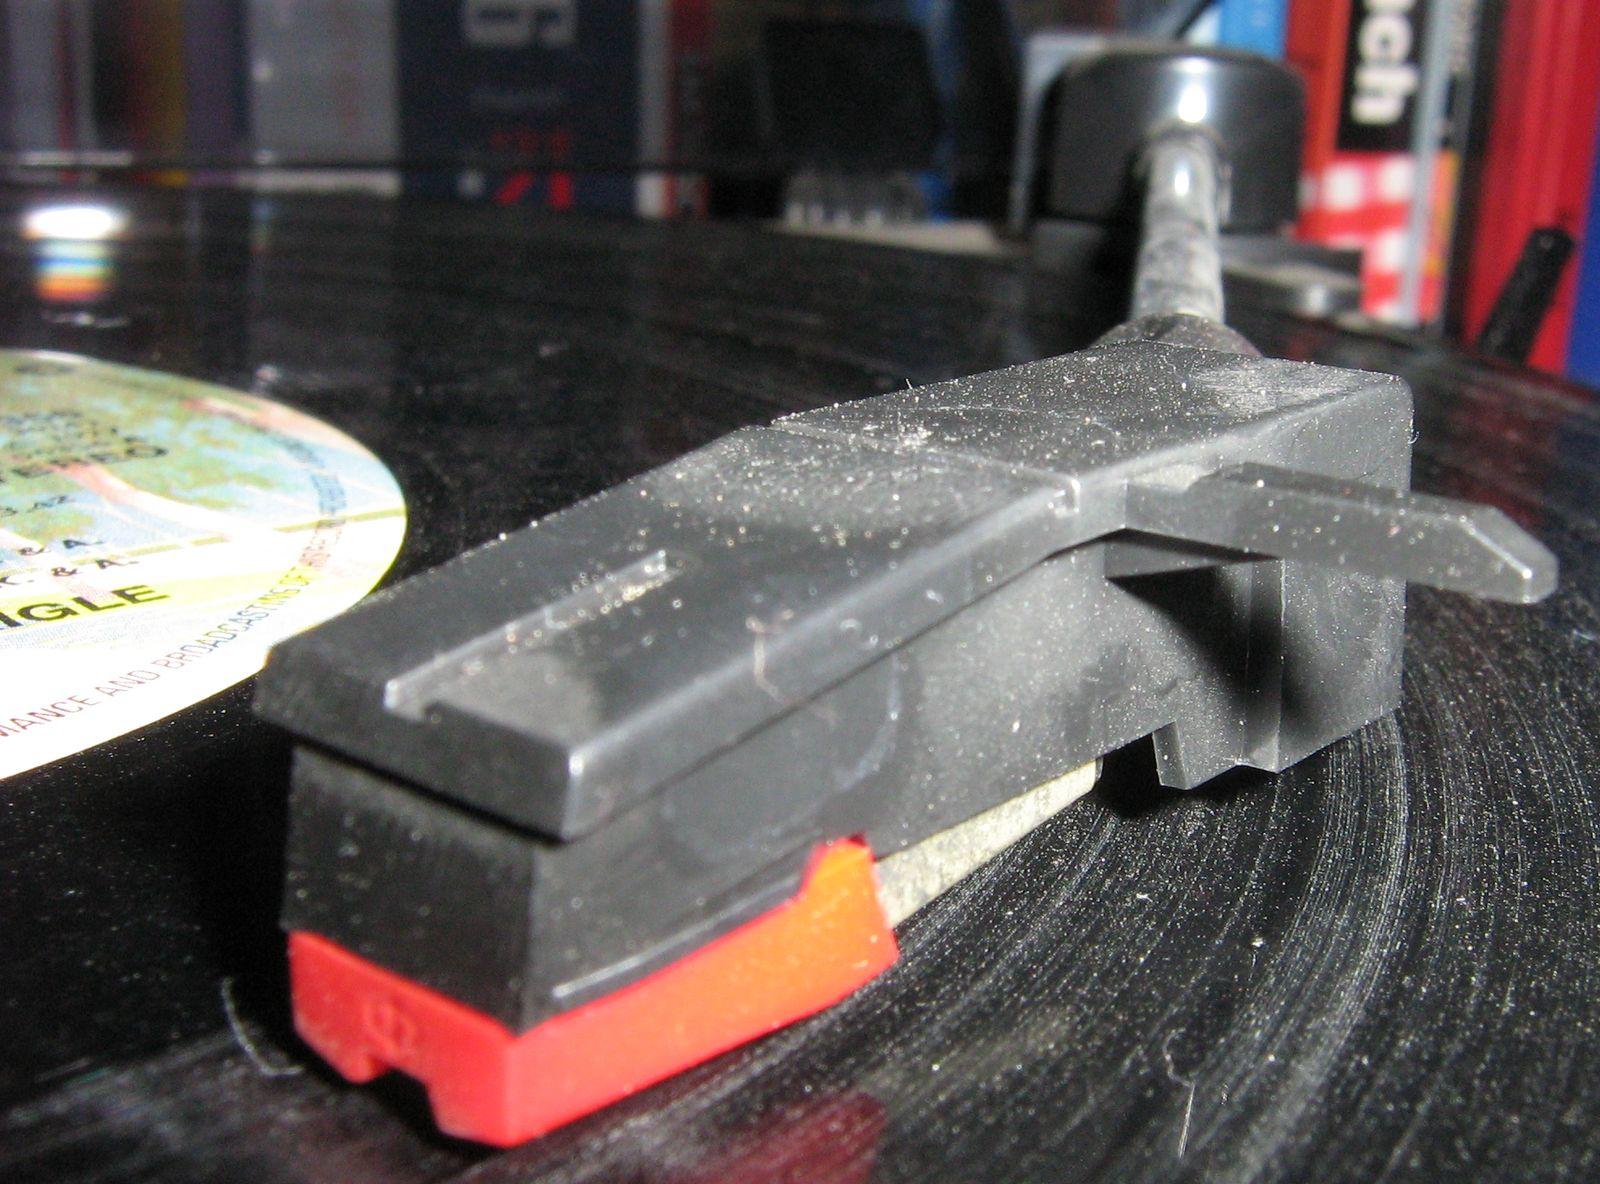 http://upload.wikimedia.org/wikipedia/commons/f/f9/Vinyl_very_dusty.jpg